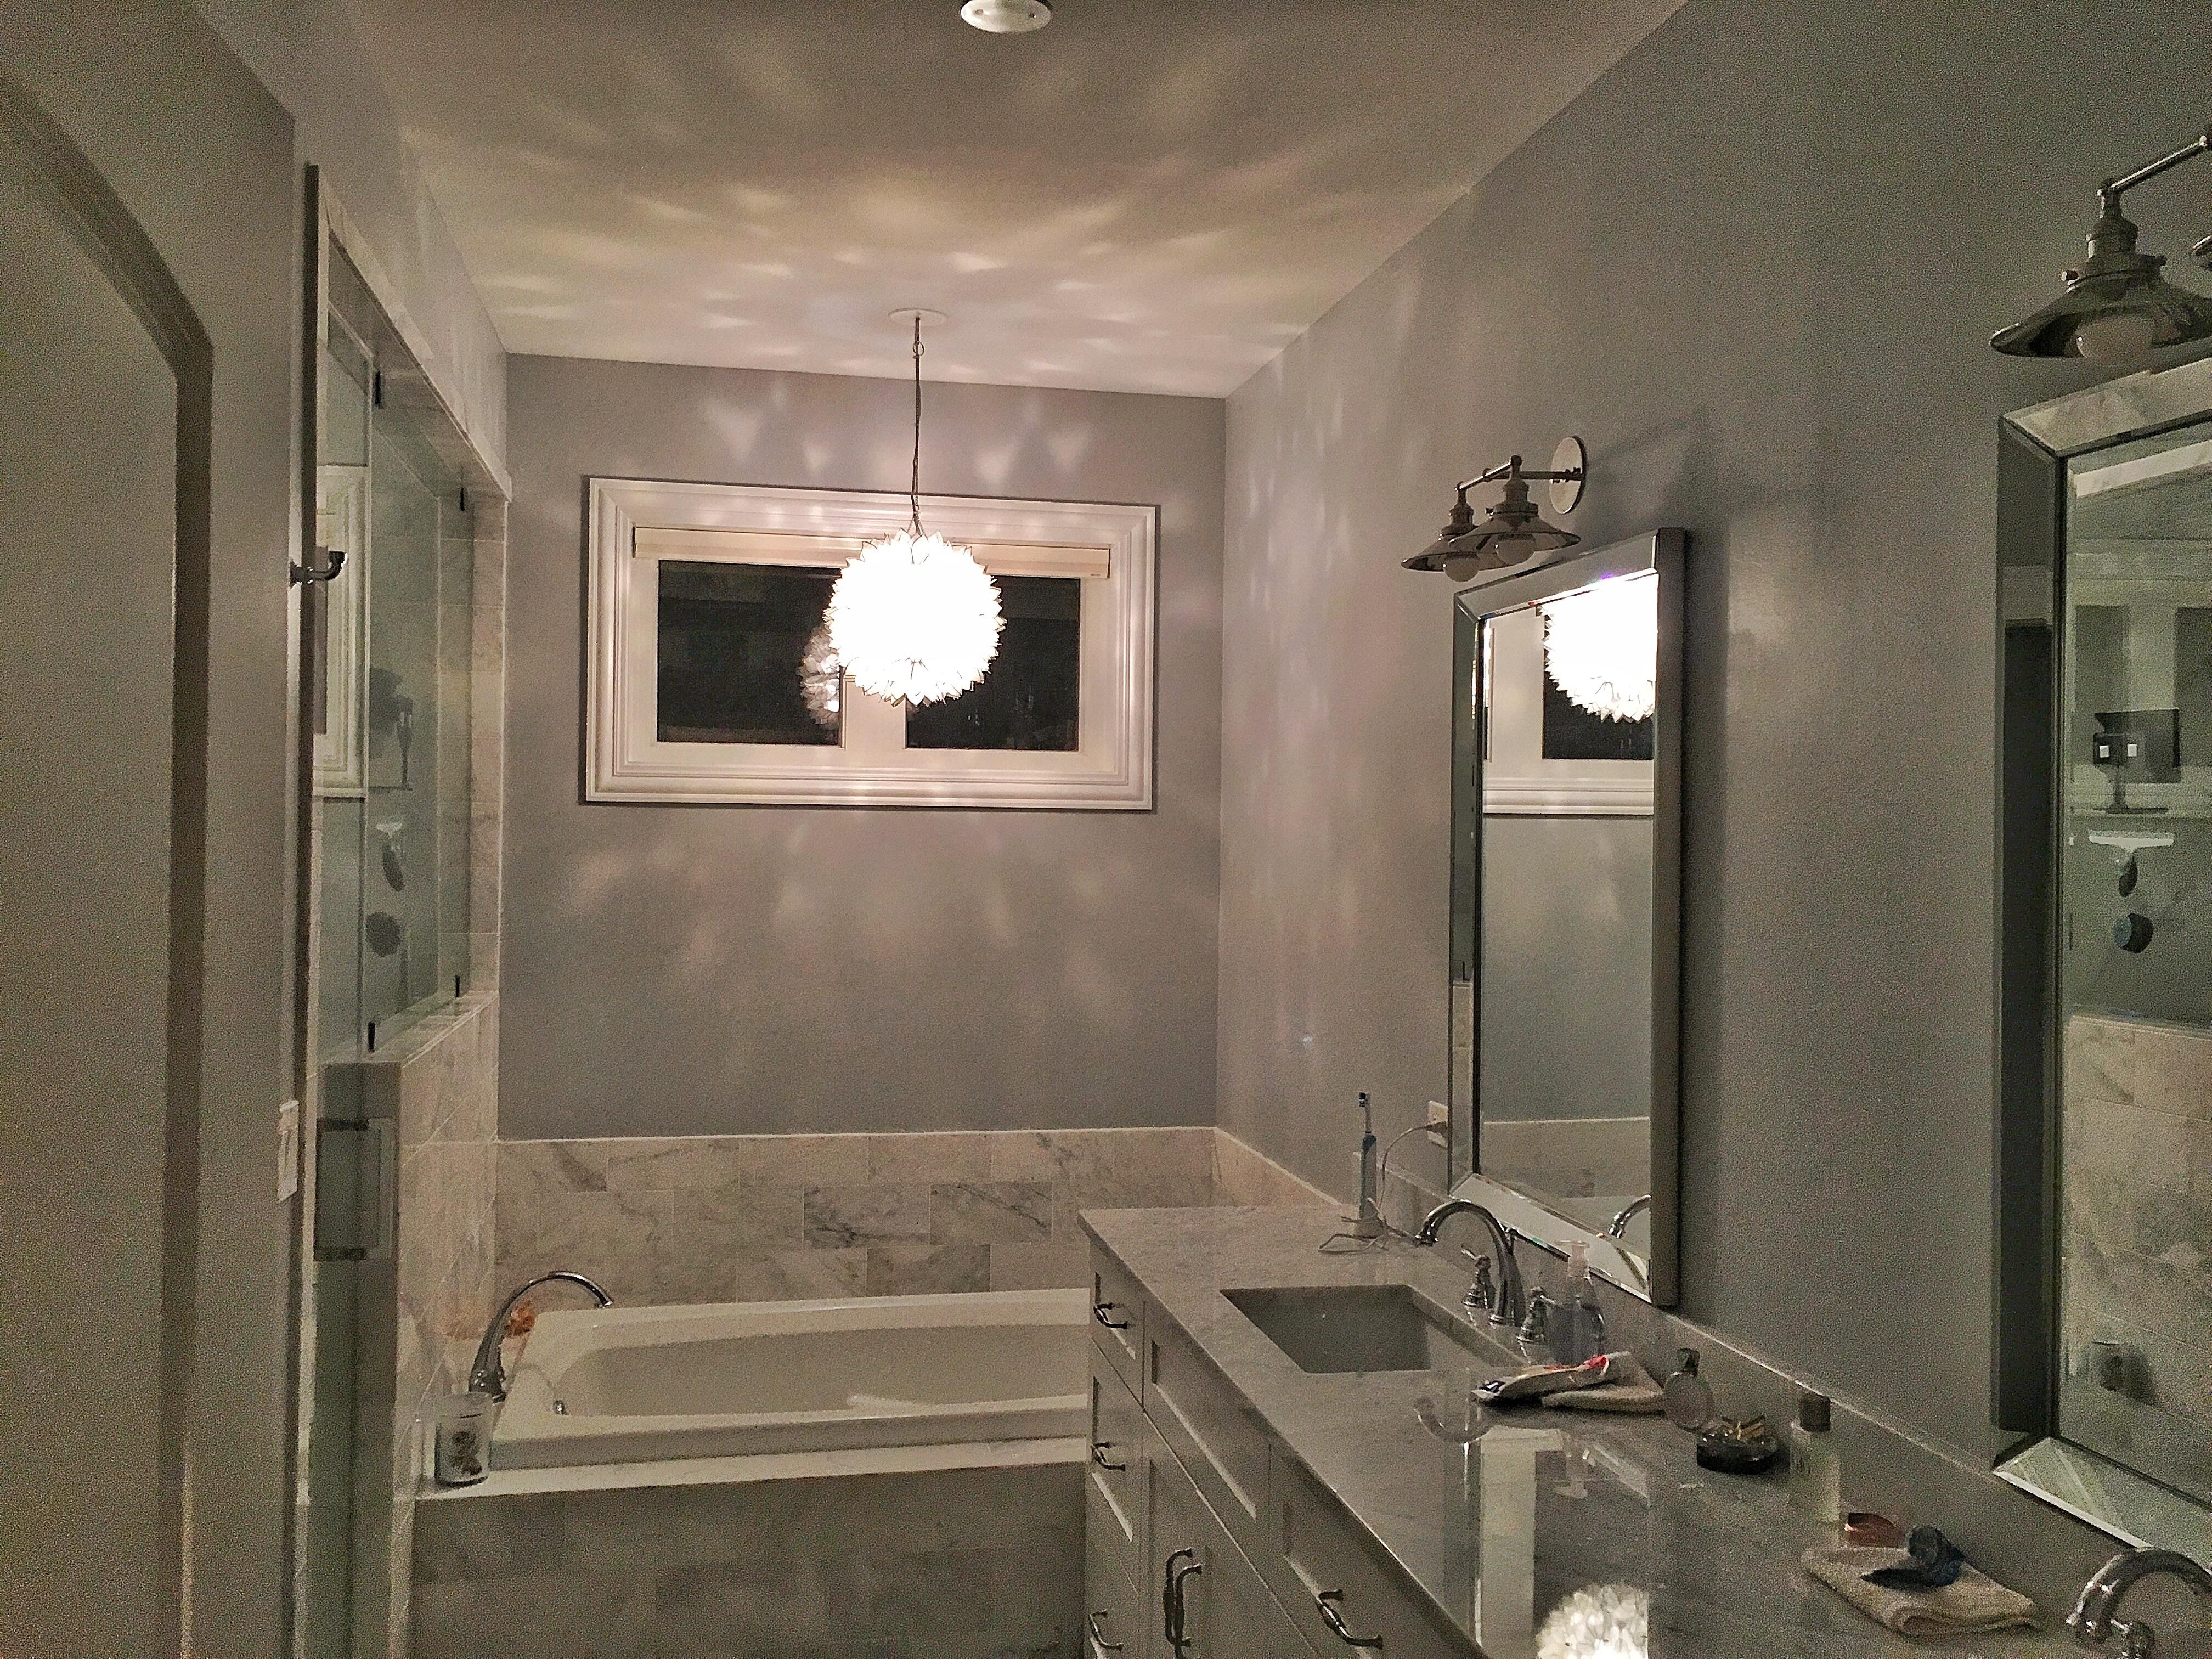 The Artesian Project Master Bath at night capiz pendant